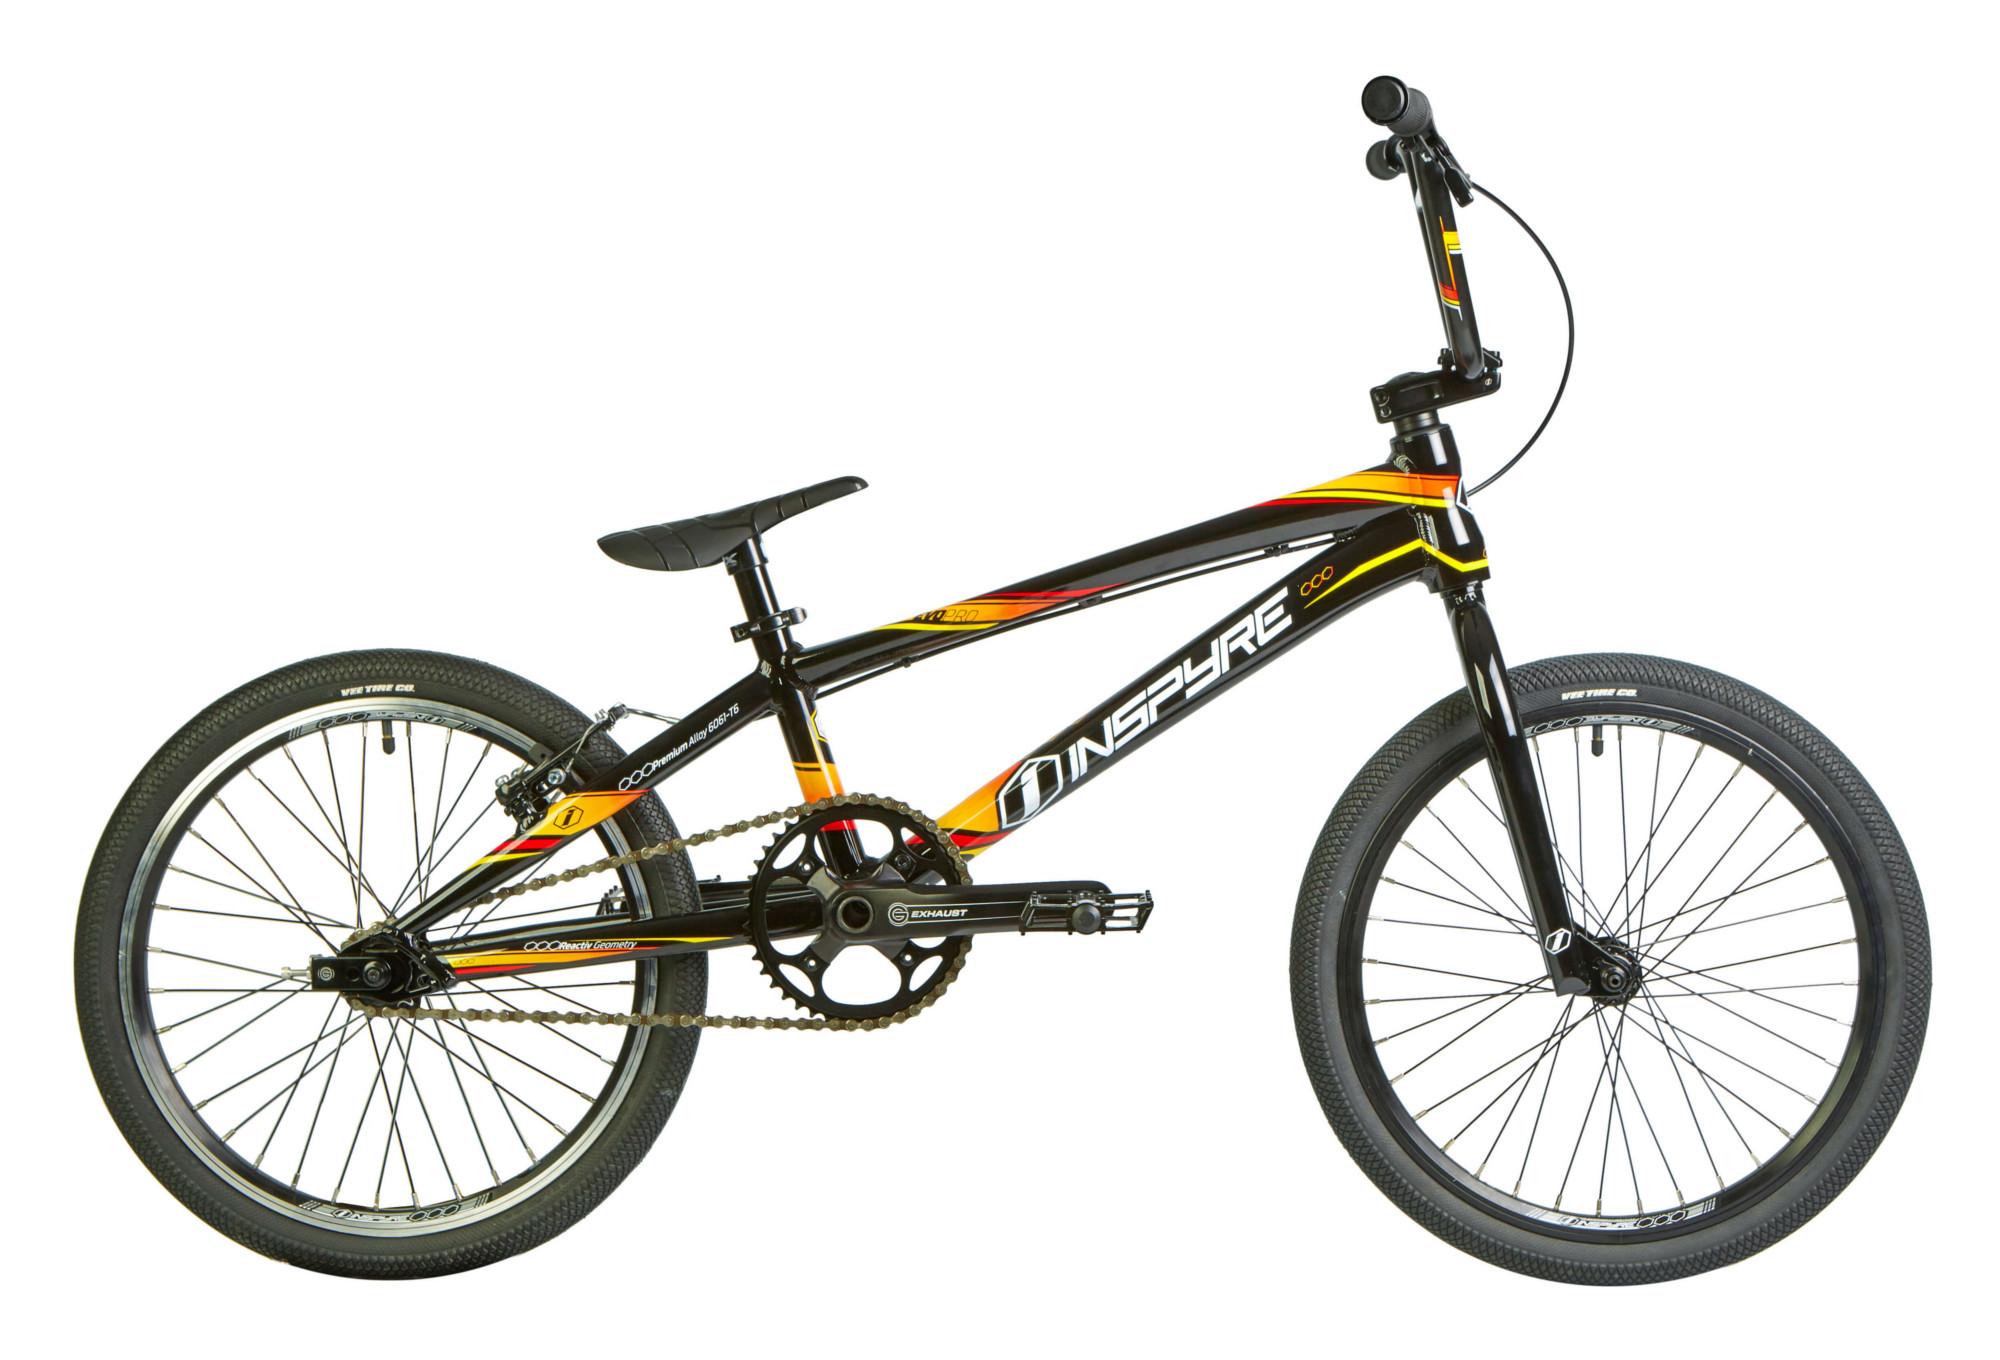 Inspyre Evo Rennen BMX Pro Schwarz Orange 2018 | Alltricks.de